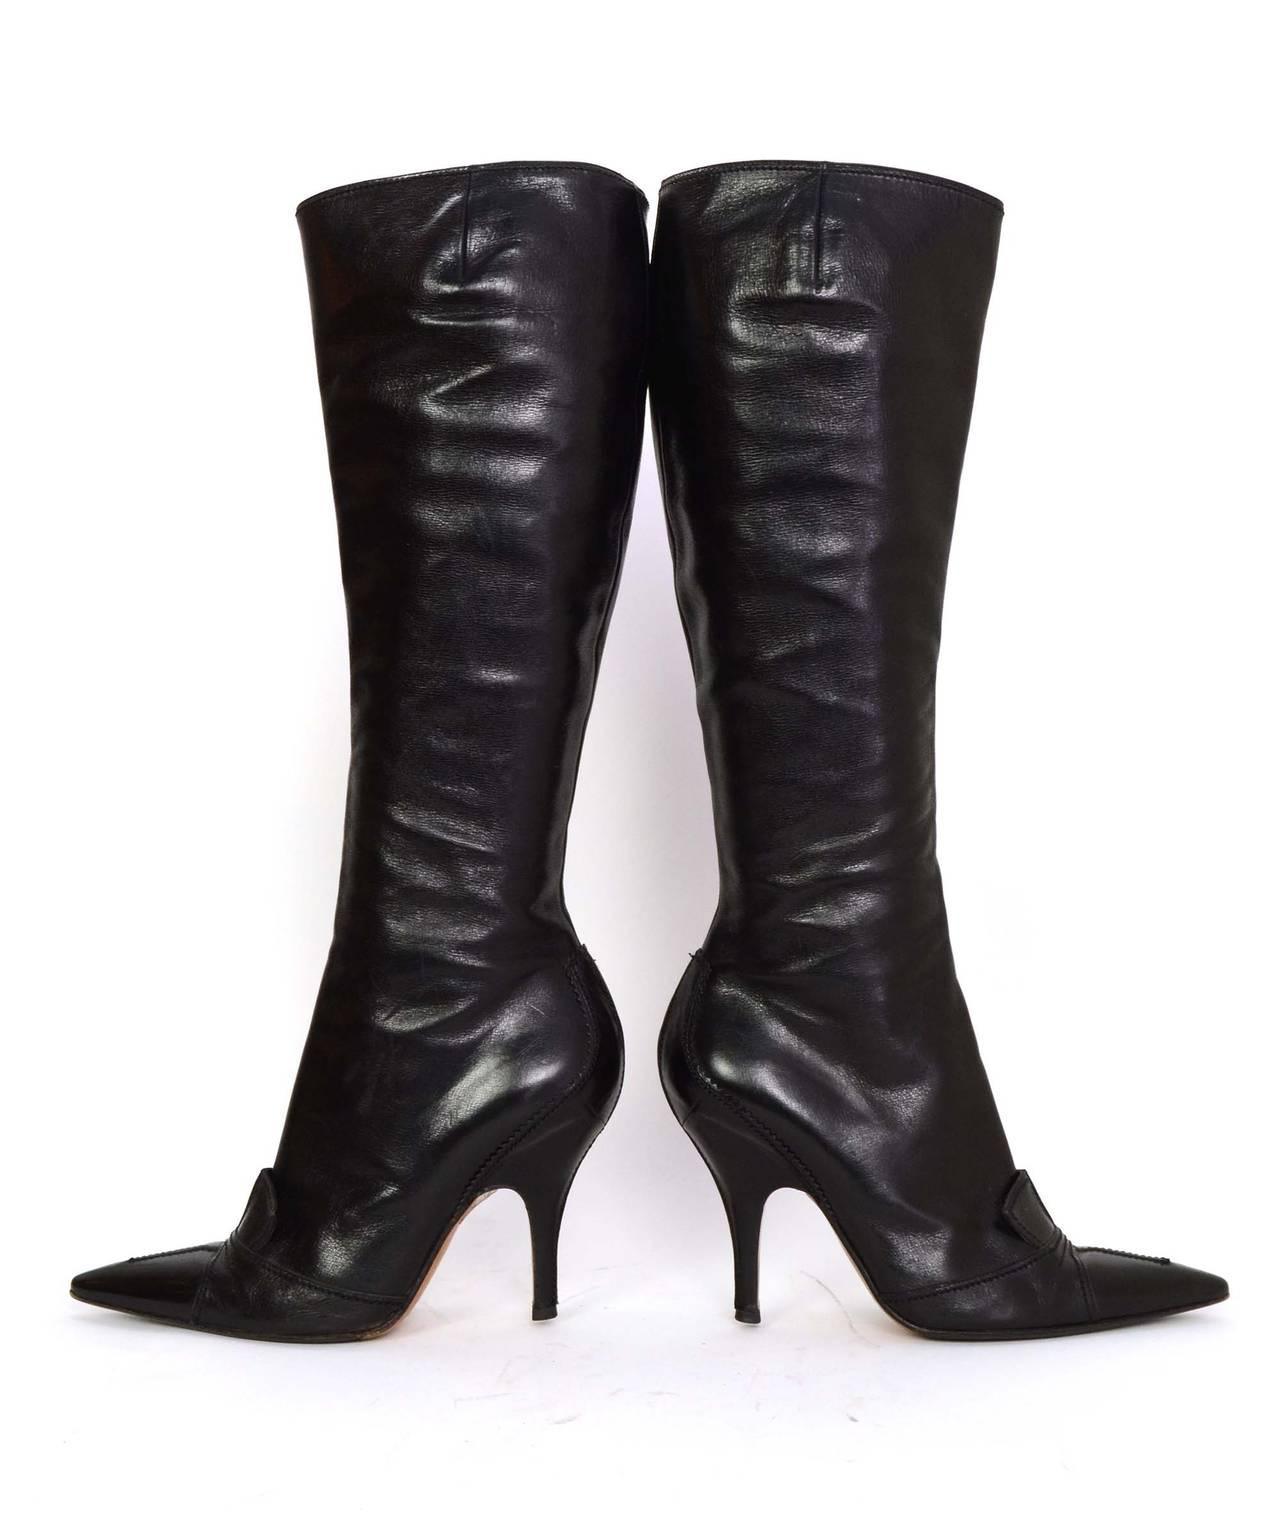 YVES SAINT LAURENT YSL Black Leather Tall Boots sz 37.5 5